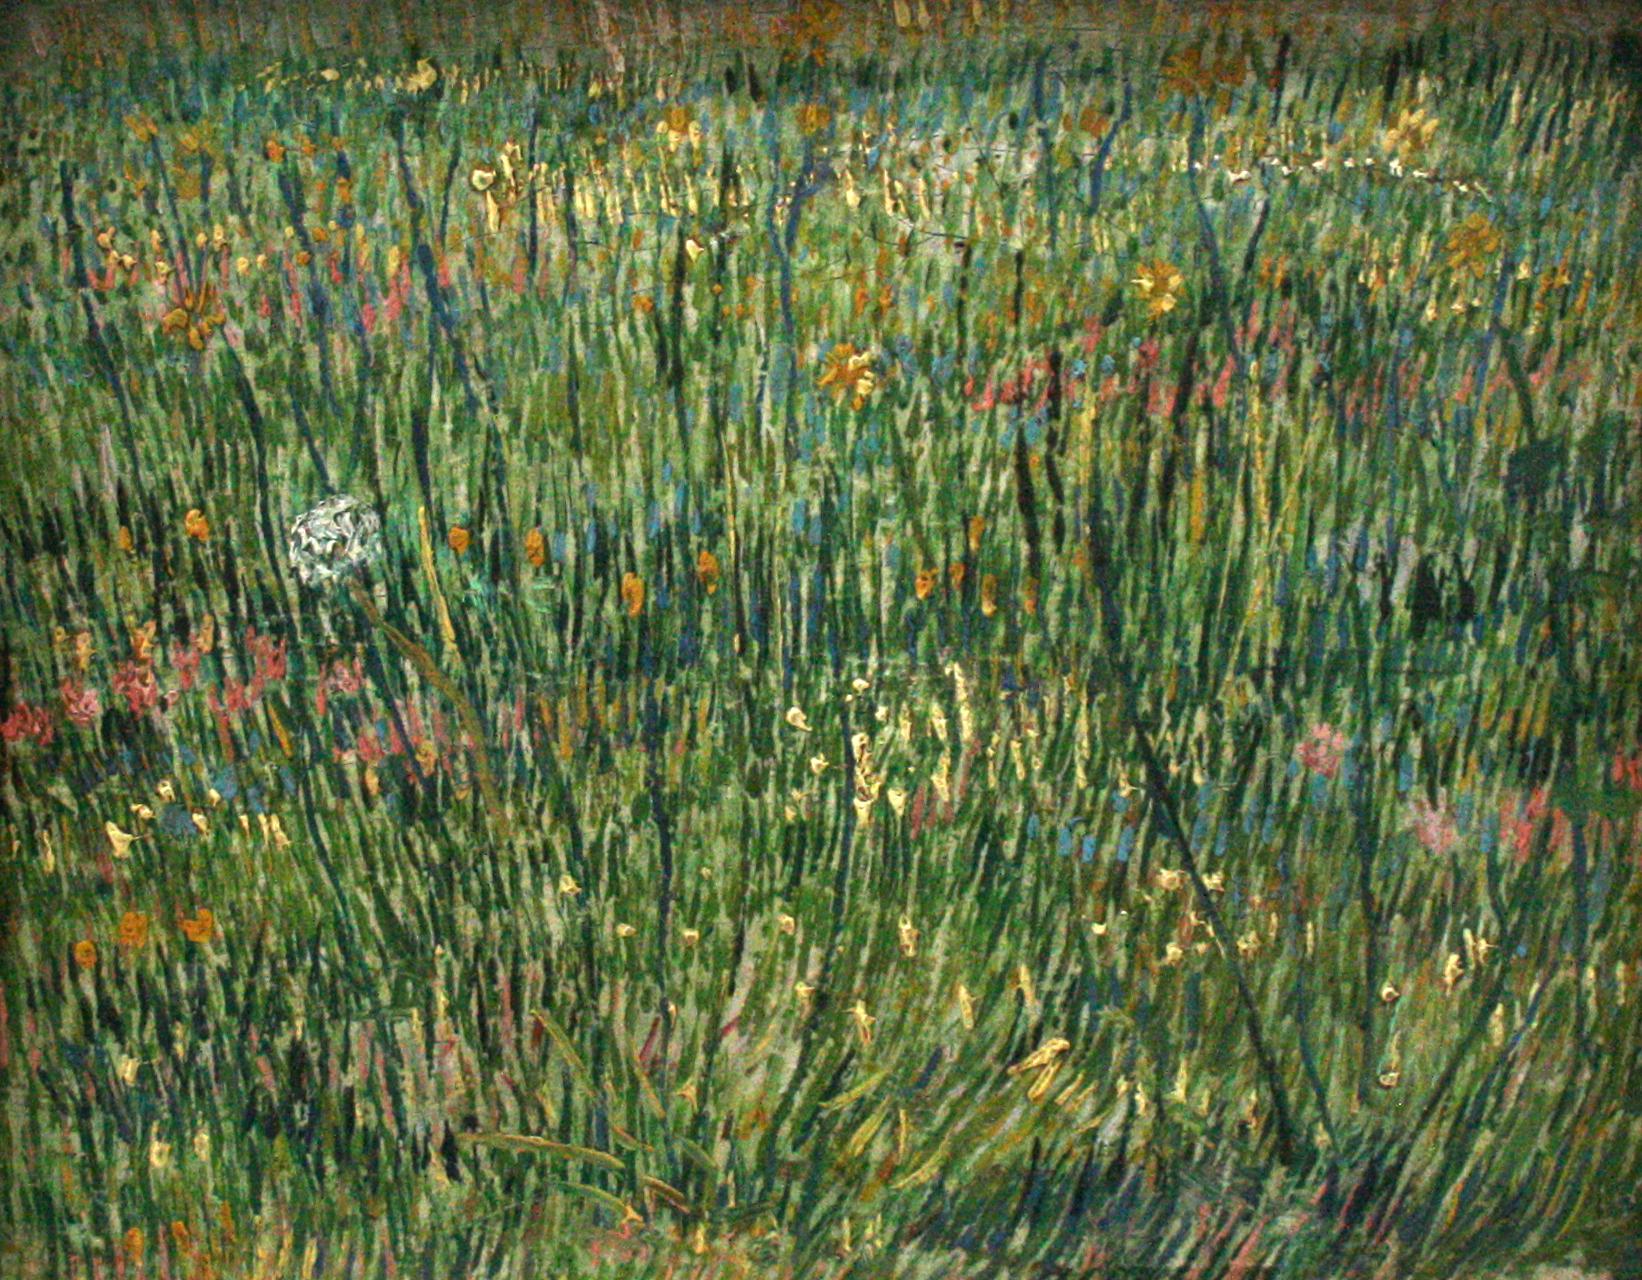 Van Gogh, Patch of grass